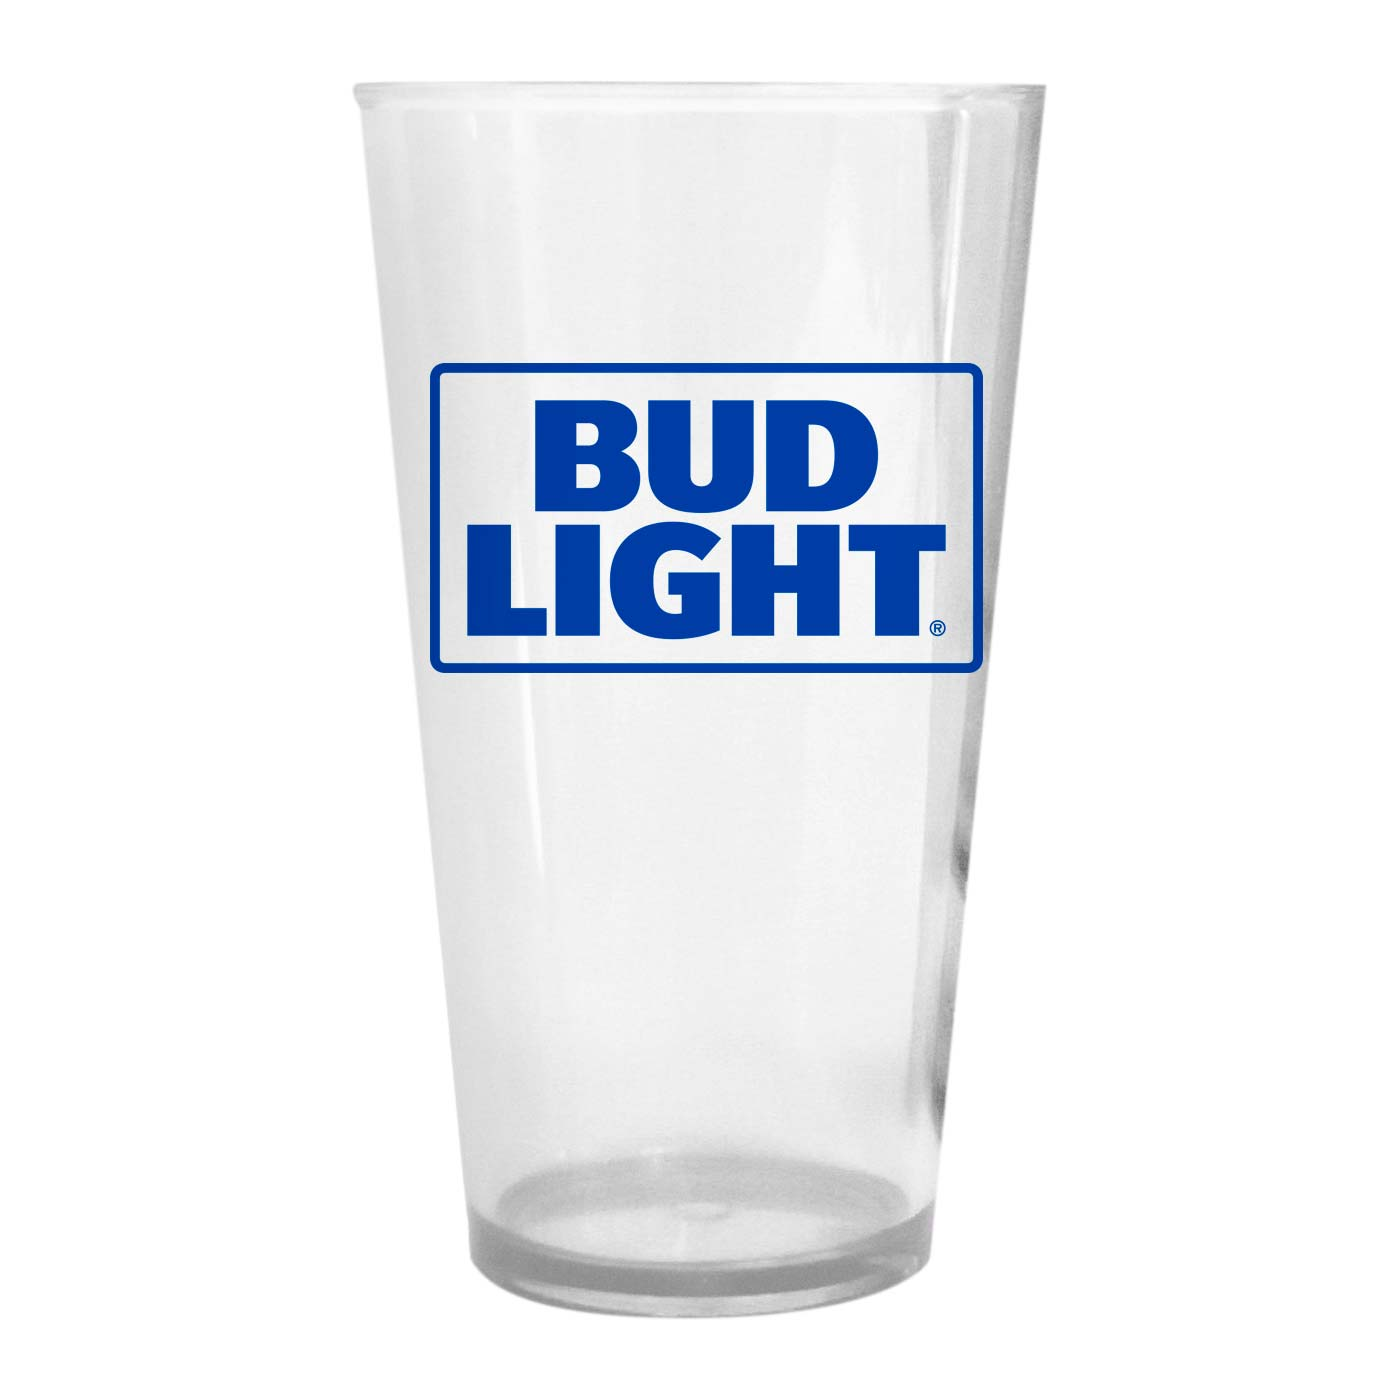 Bud Light Plastic Pint Glass by